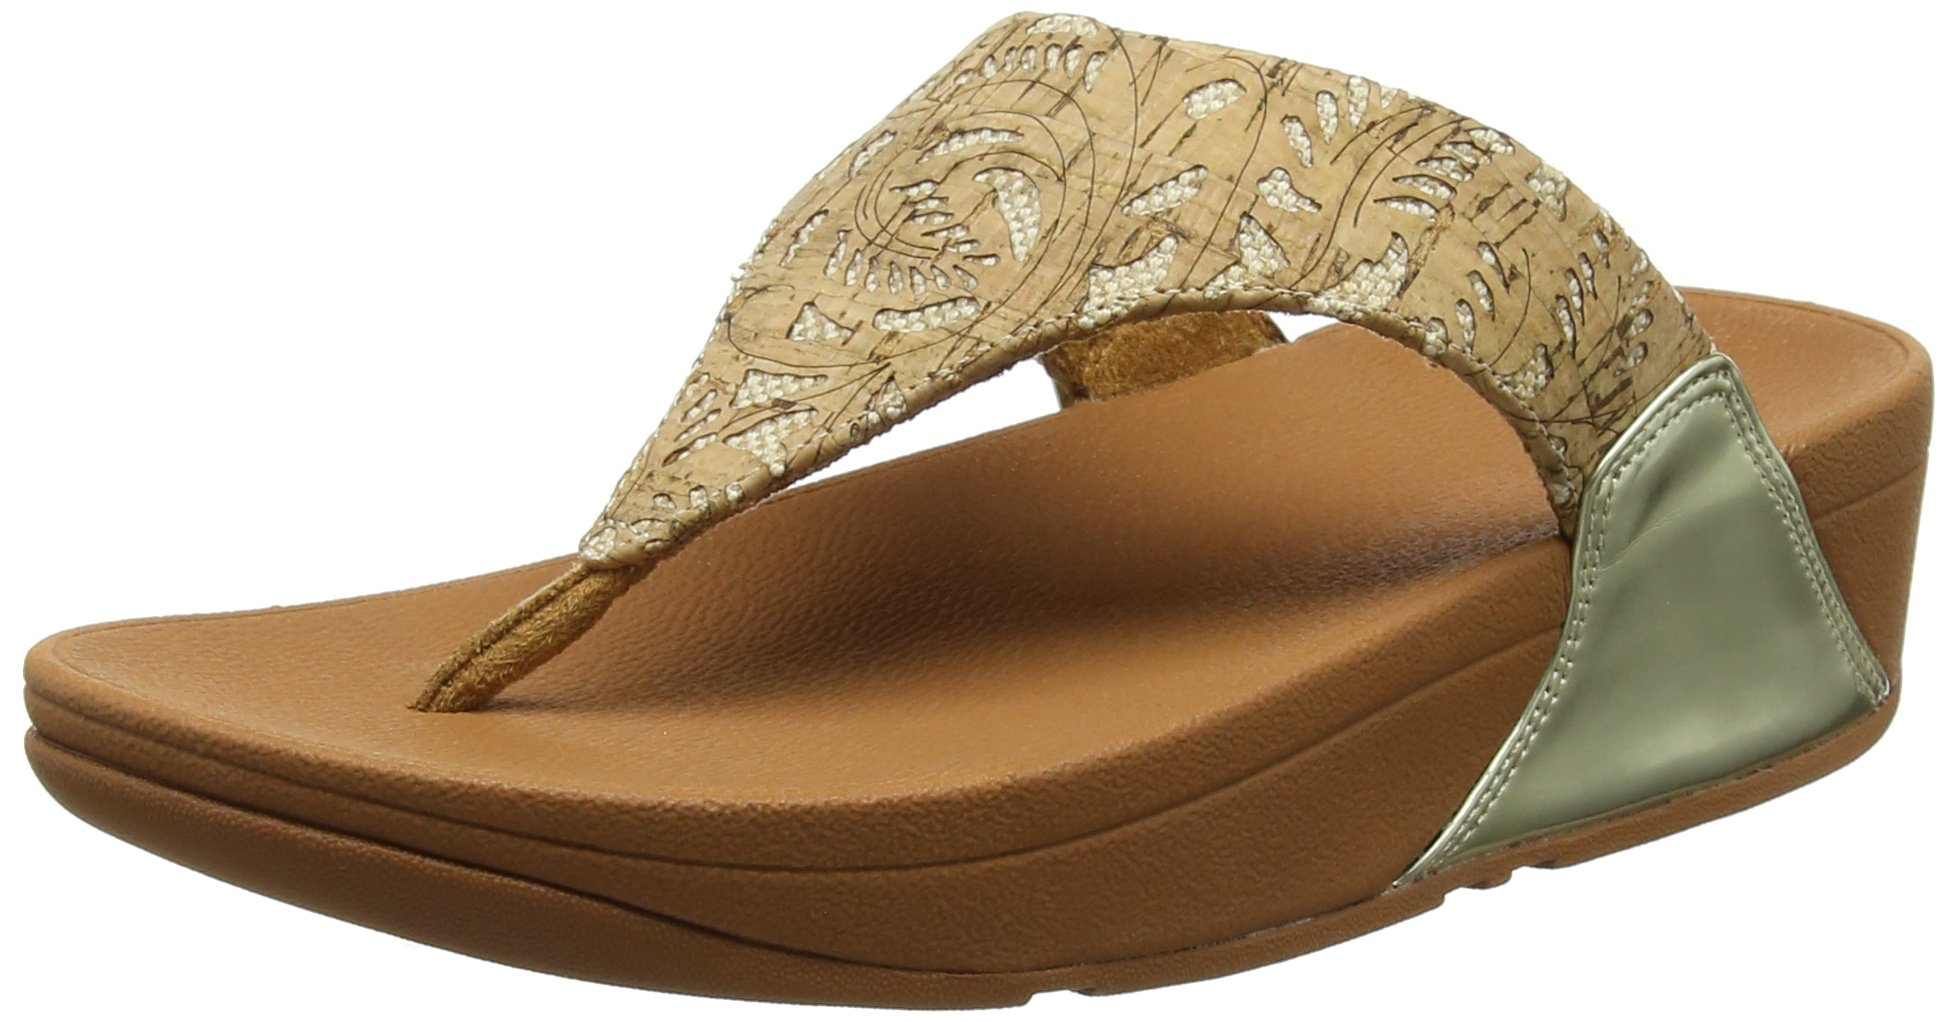 corkBout mirror FemmeMulticolore thong Ouvert Gold Eu 55339 Lulu Toe Fitflop Sandals by76Yfg